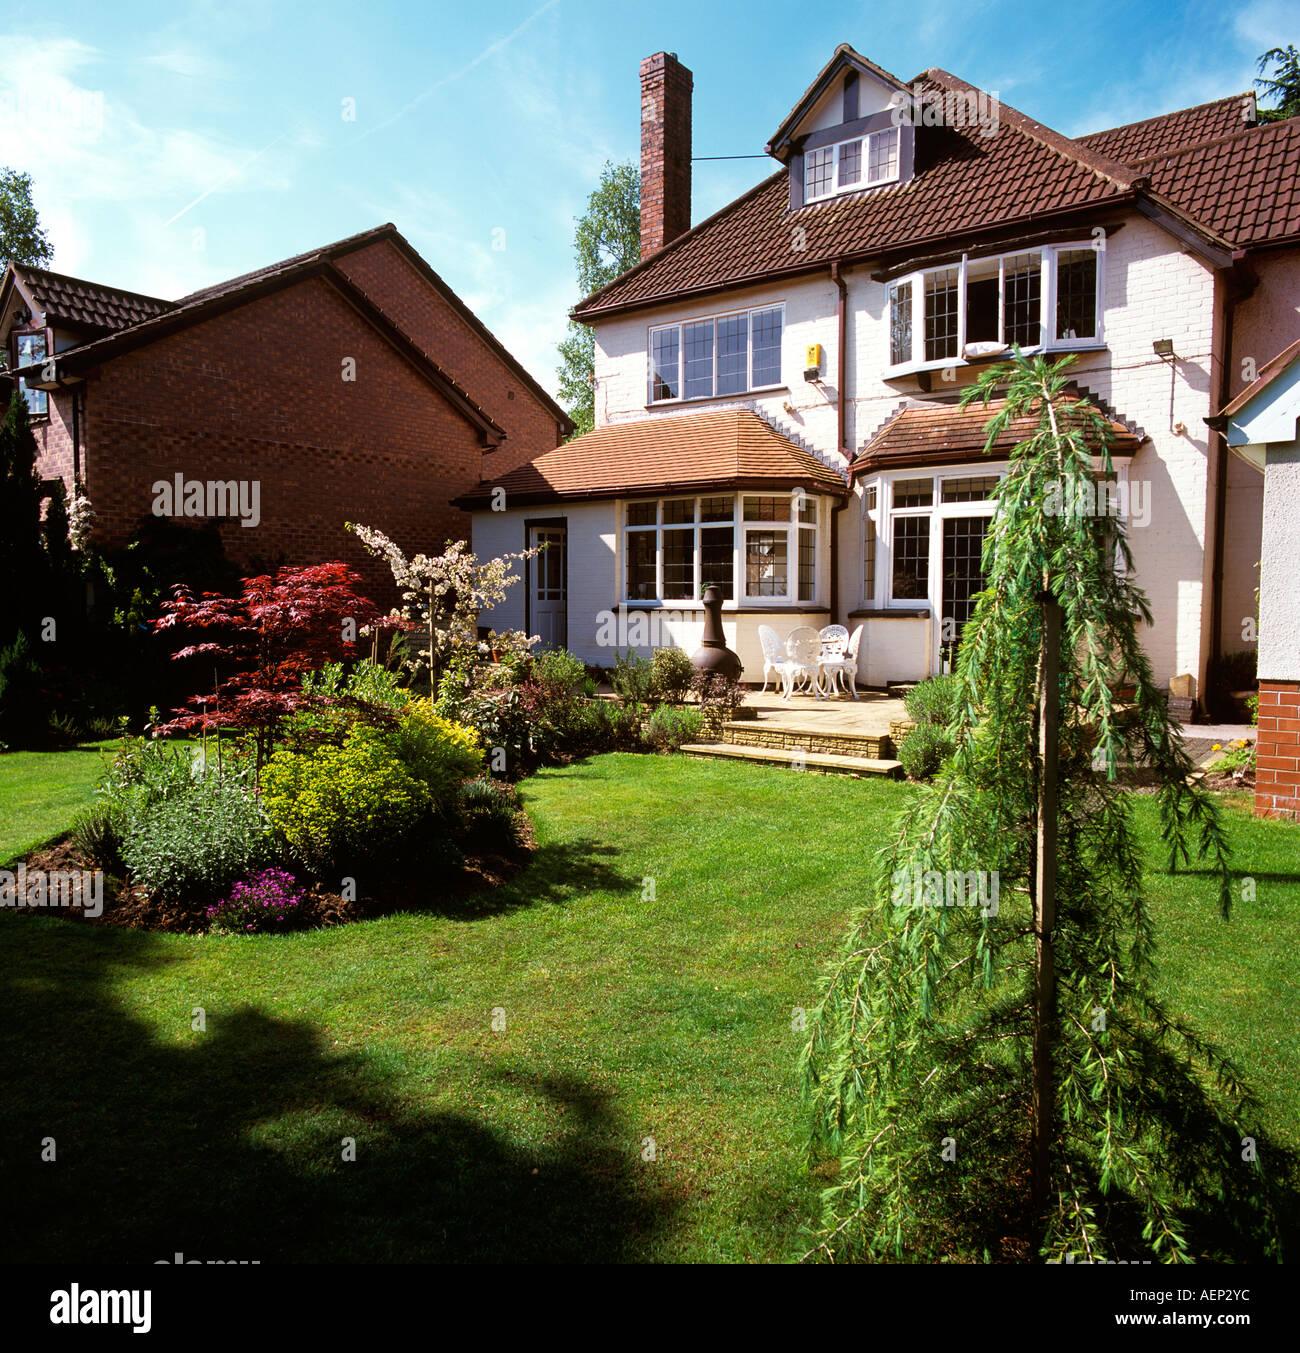 Home Improvements Back Garden Of Large Detached House